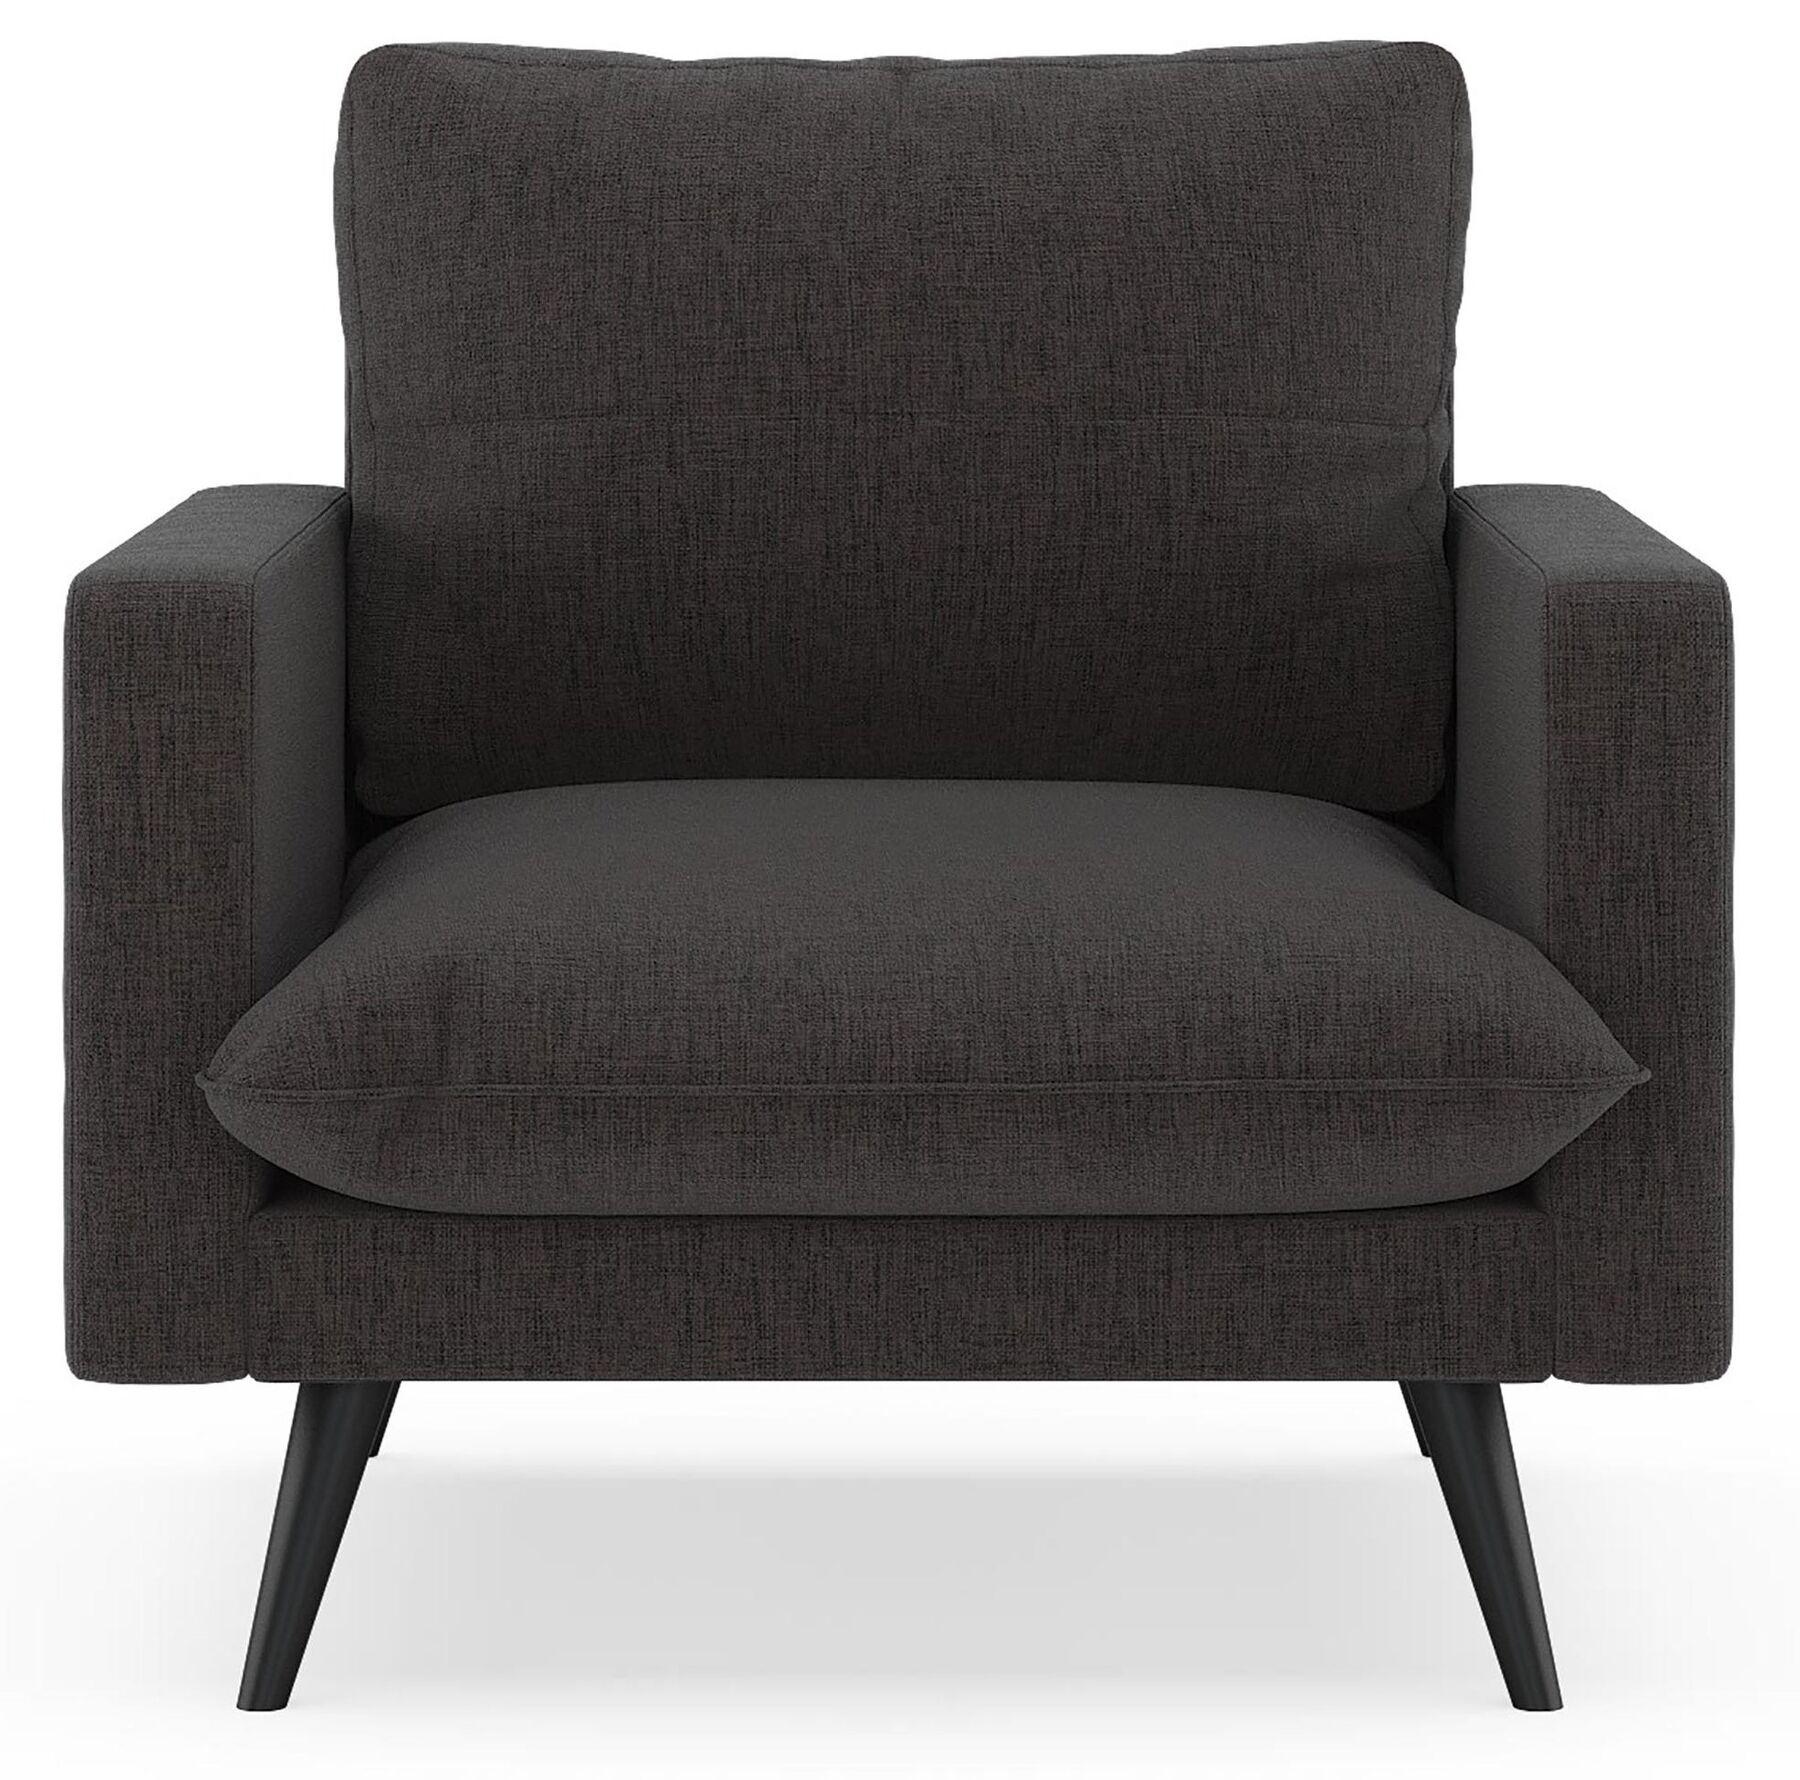 Cronk Armchair Upholstery: Avocado, Finish: Black